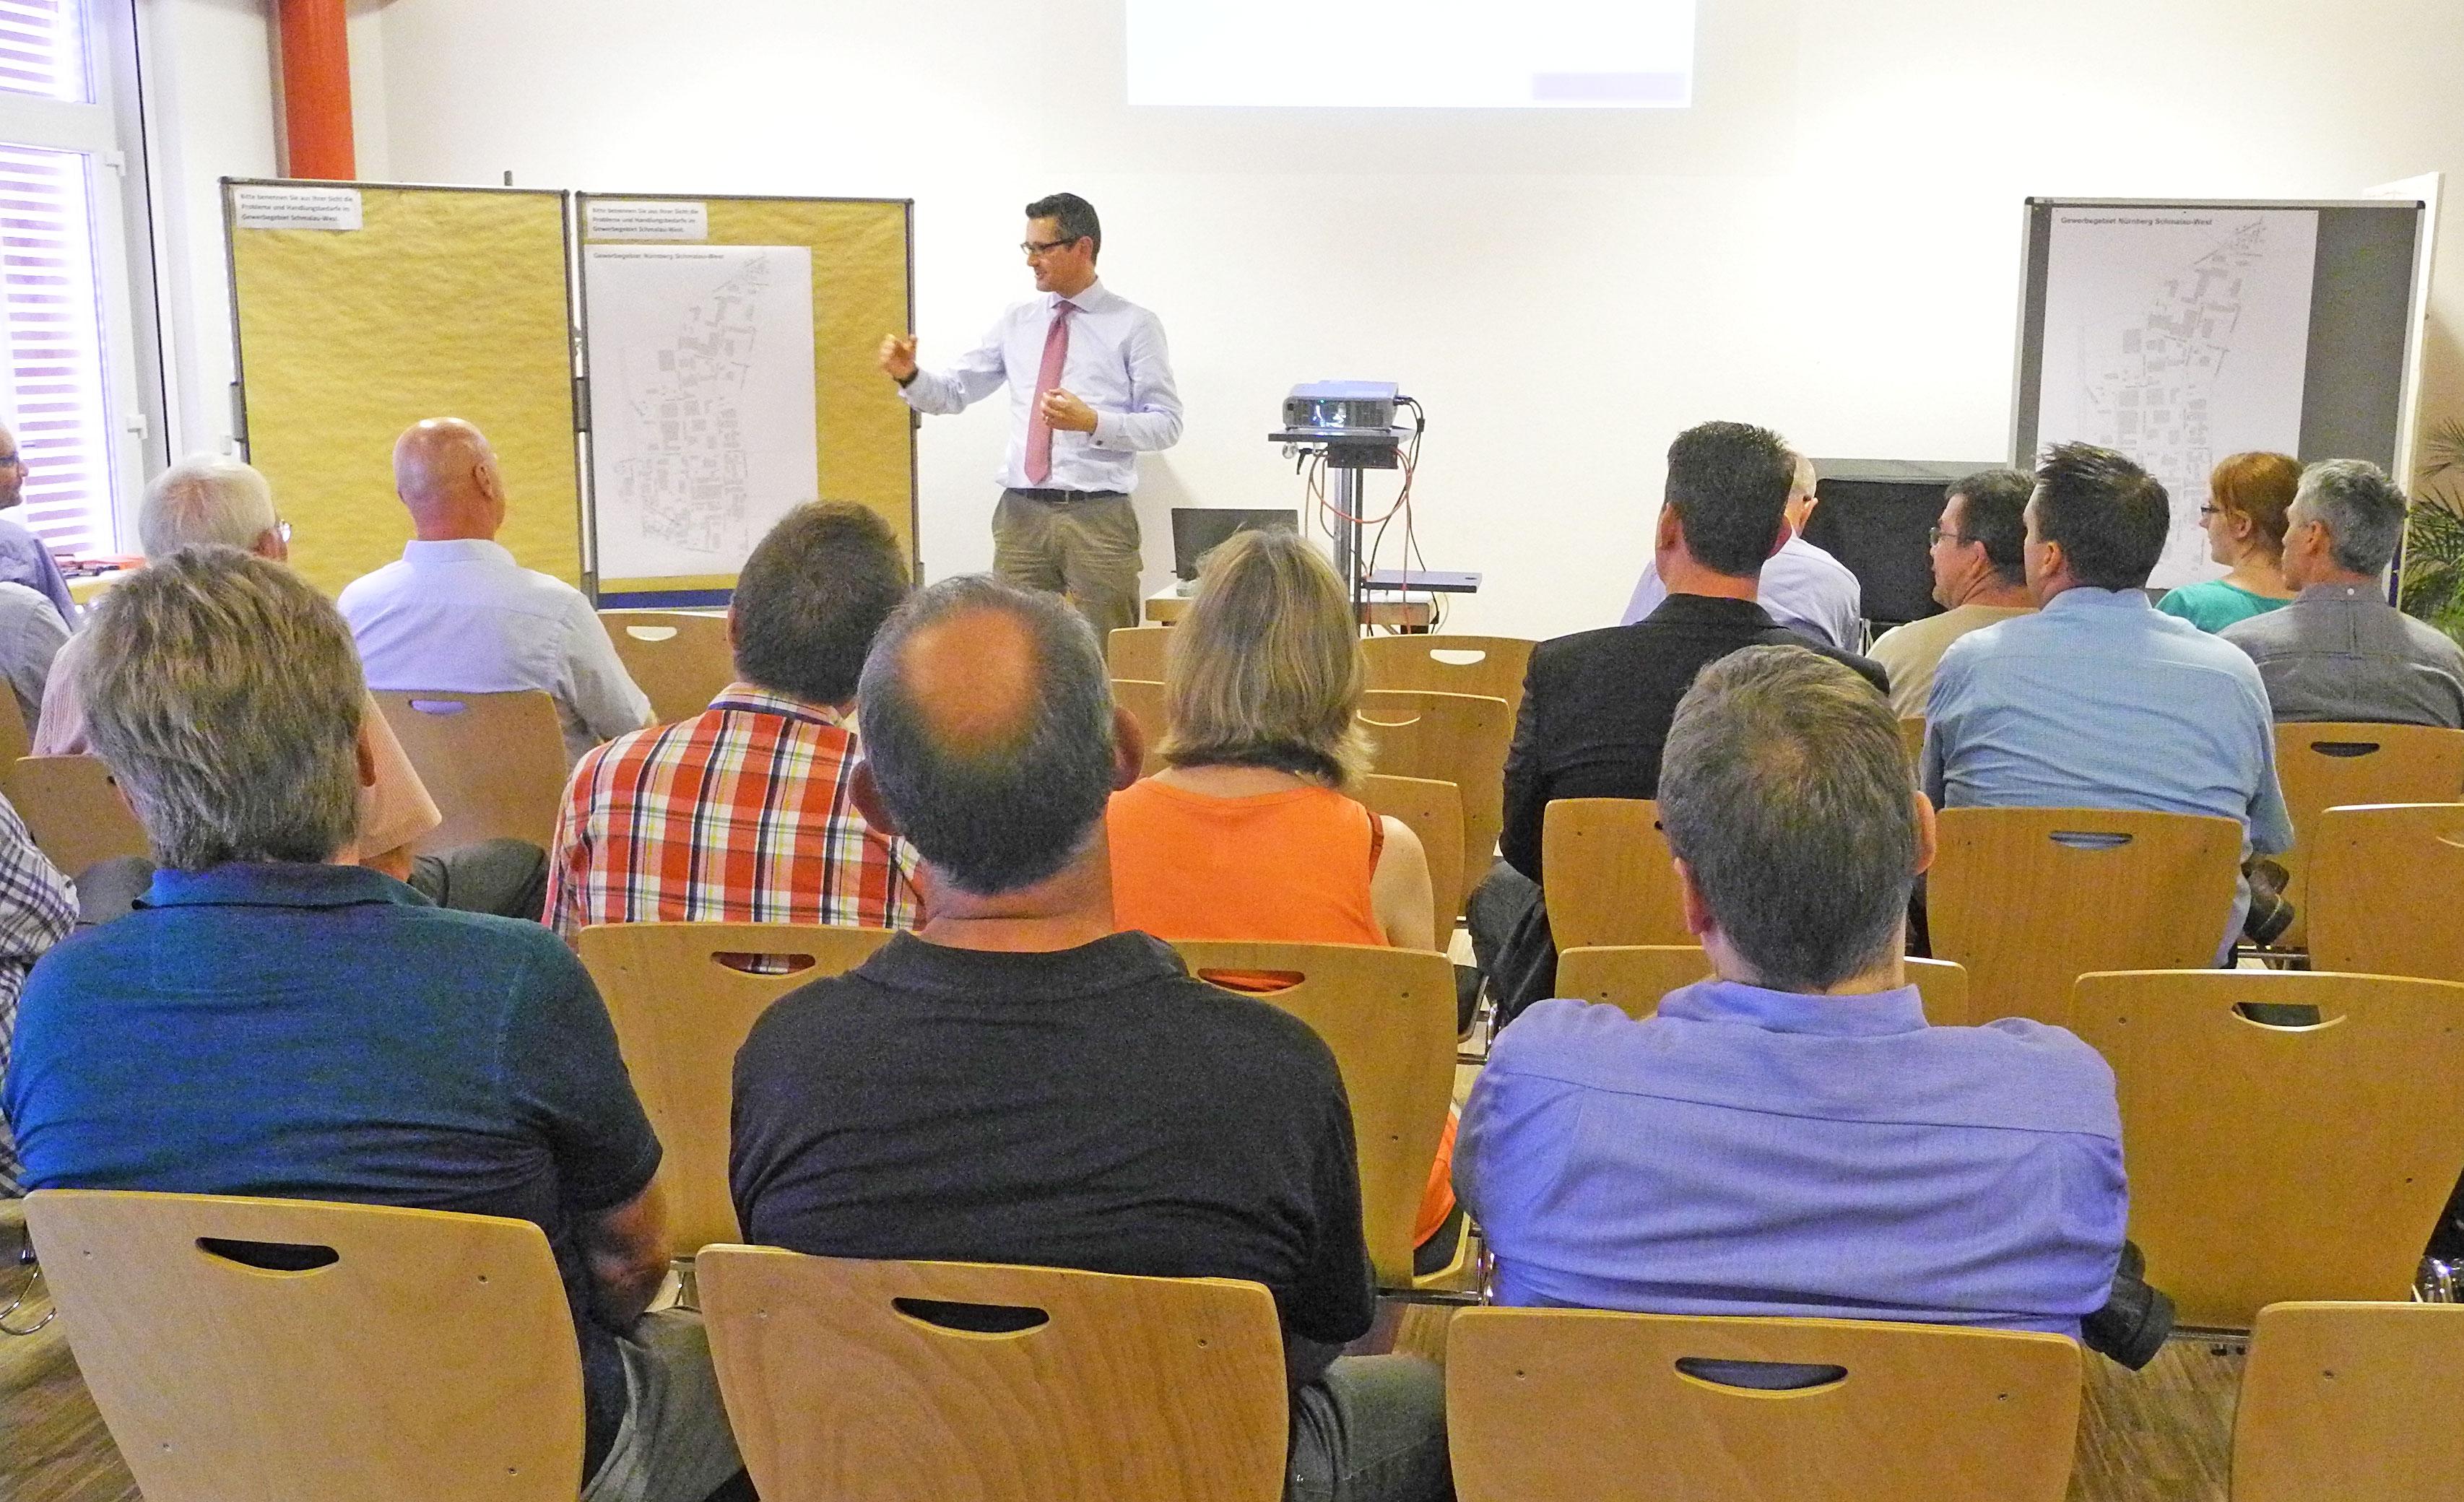 Gewerbegebietskonferenz im Nürnberger Gewerbegebiet Schmalau-West